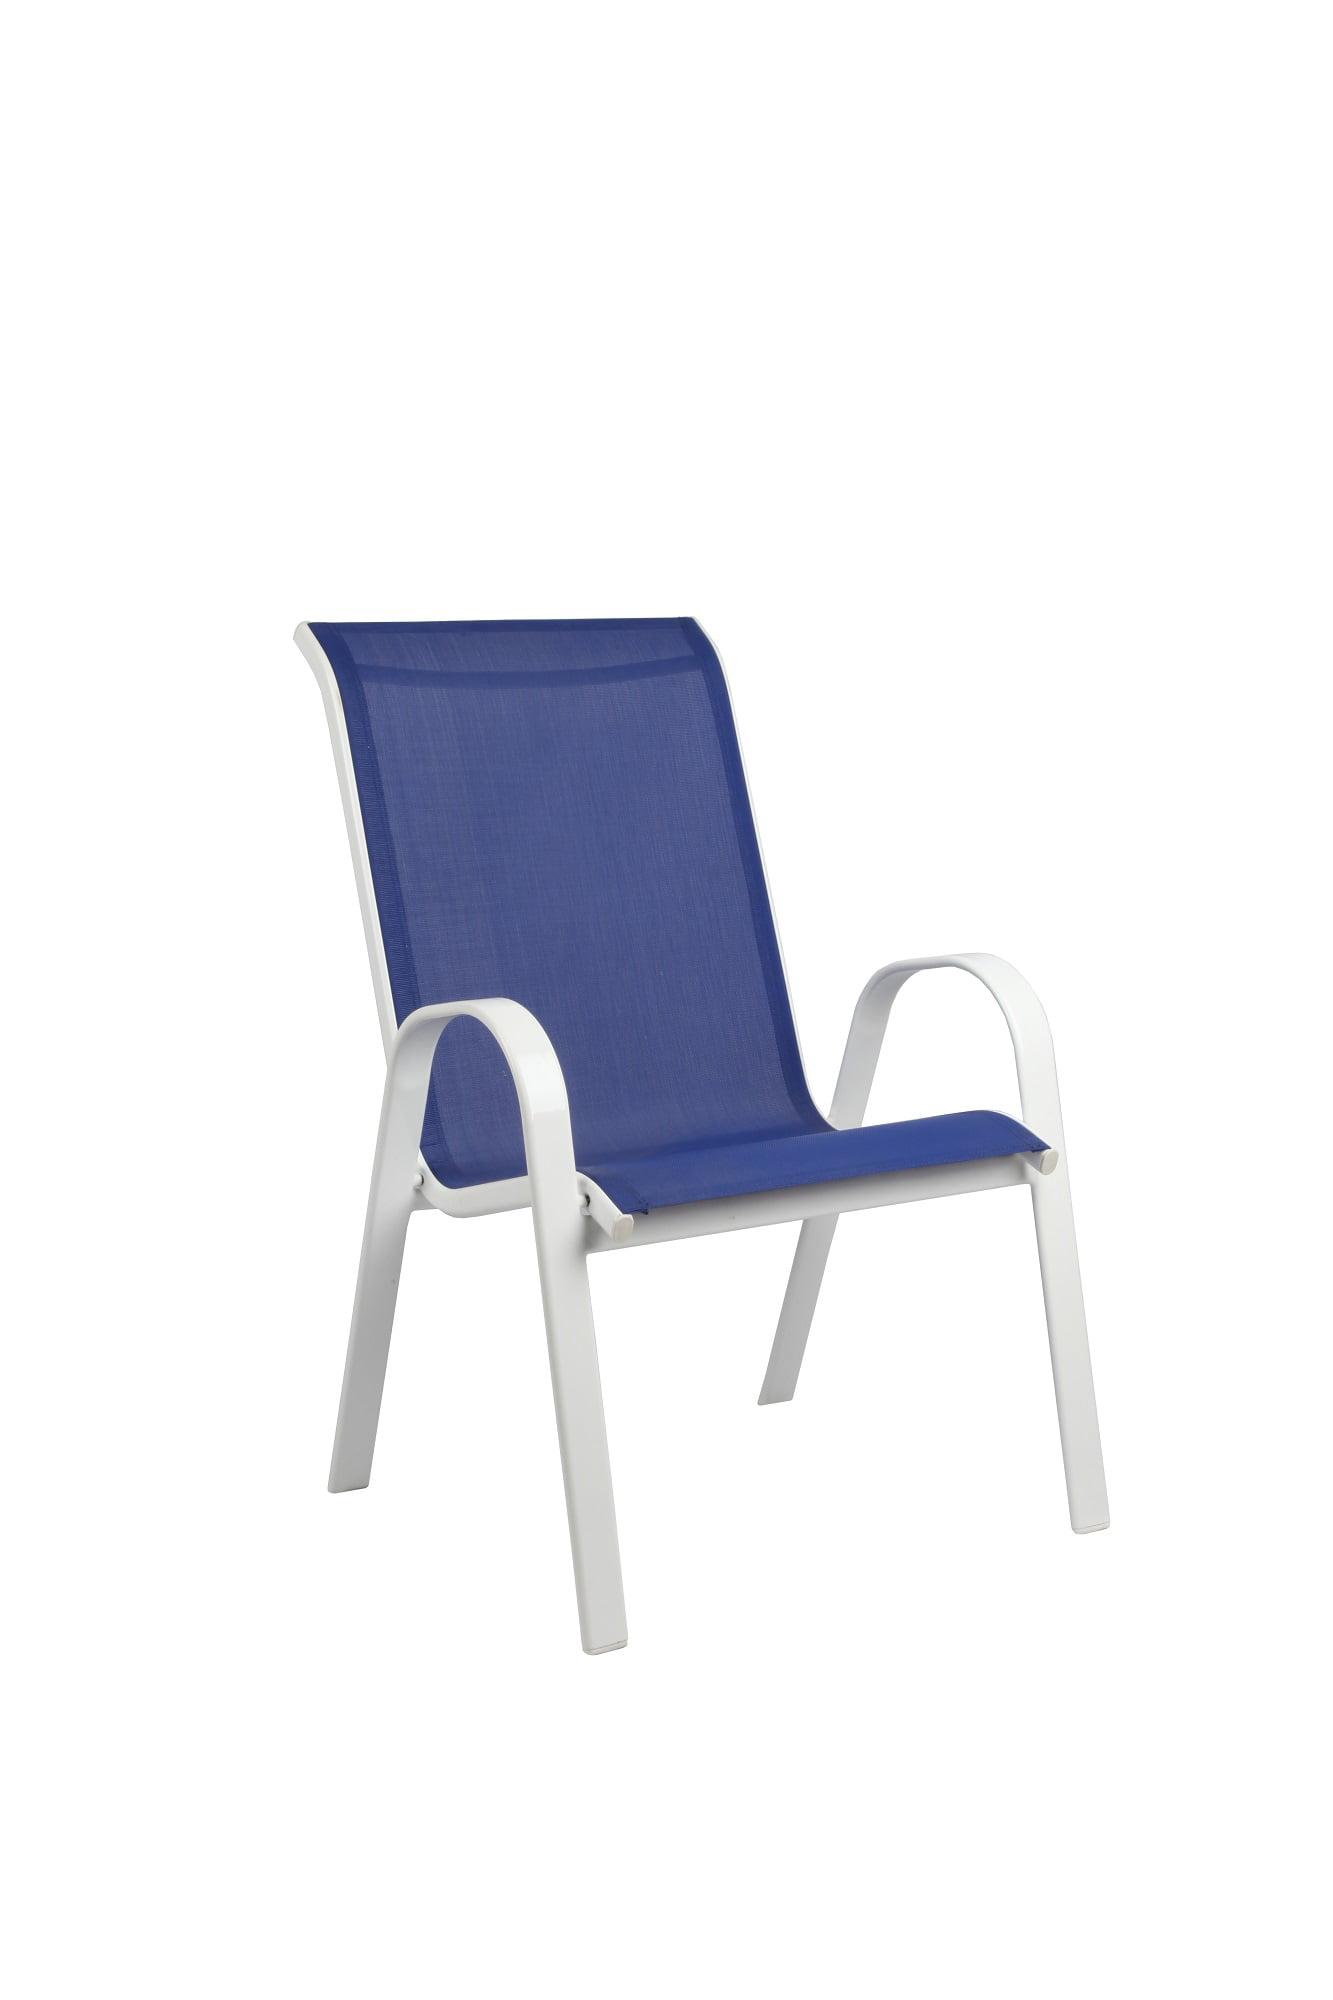 Mainstays Xl Sling Chair Blue White Walmart Inventory